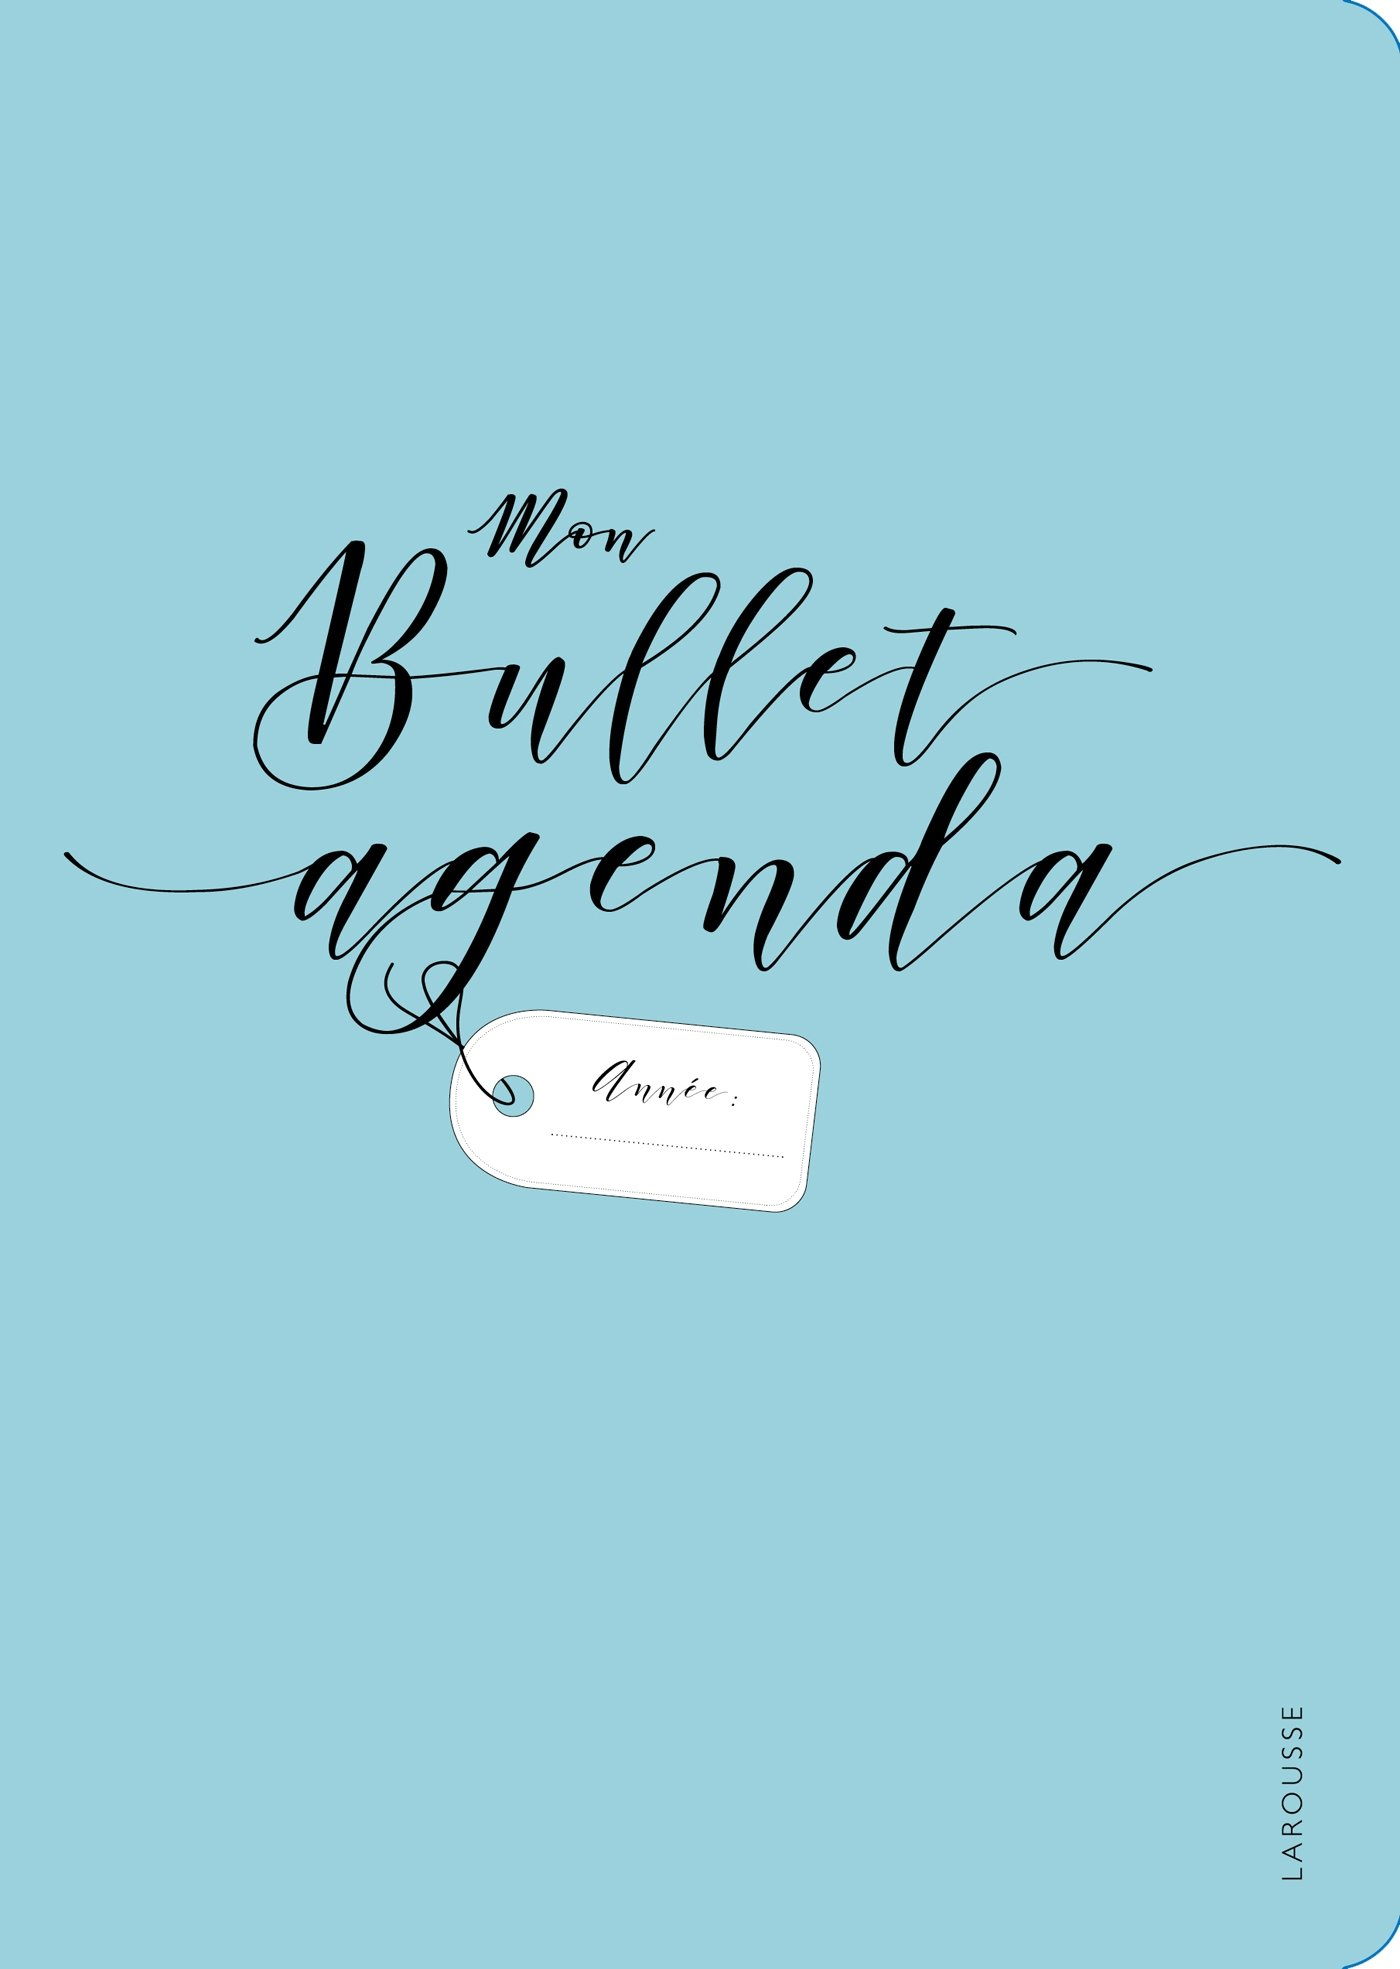 Mon bullet agenda: Amazon.es: Larousse: Libros en idiomas ...